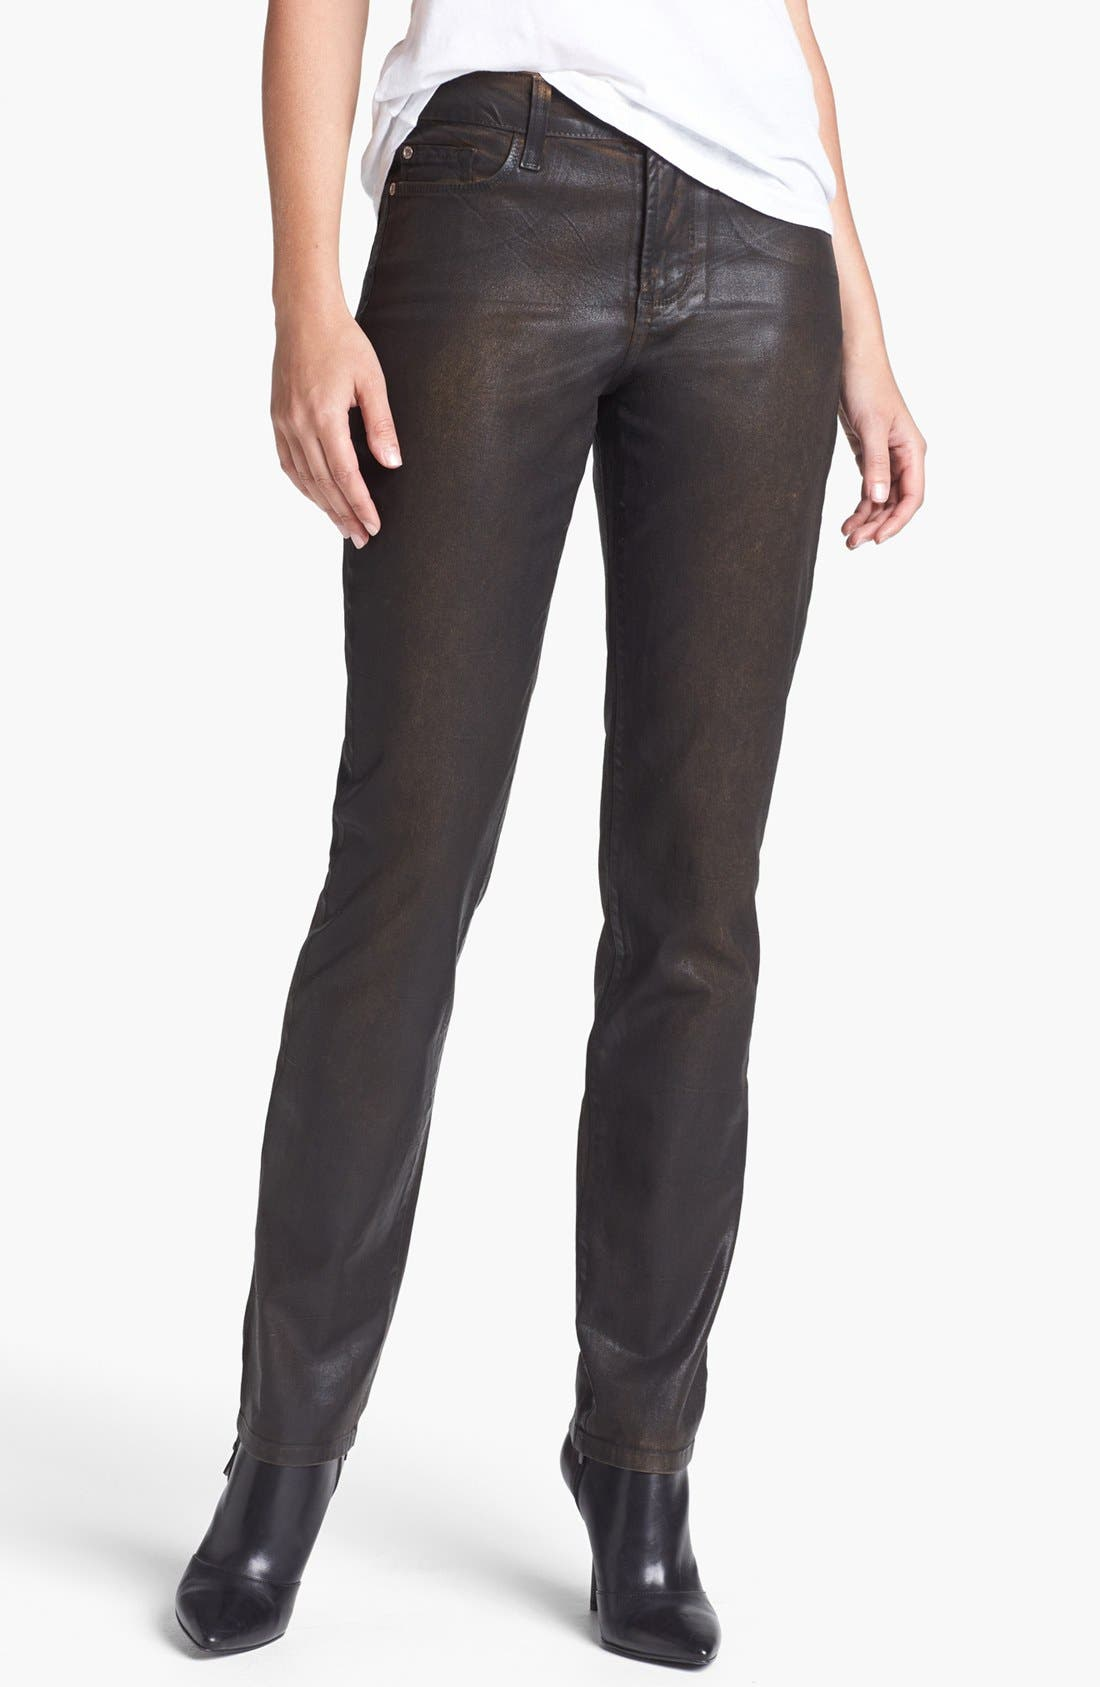 Alternate Image 1 Selected - NYDJ 'Sheri' Coated Stretch Skinny Jeans (Beat Leather)